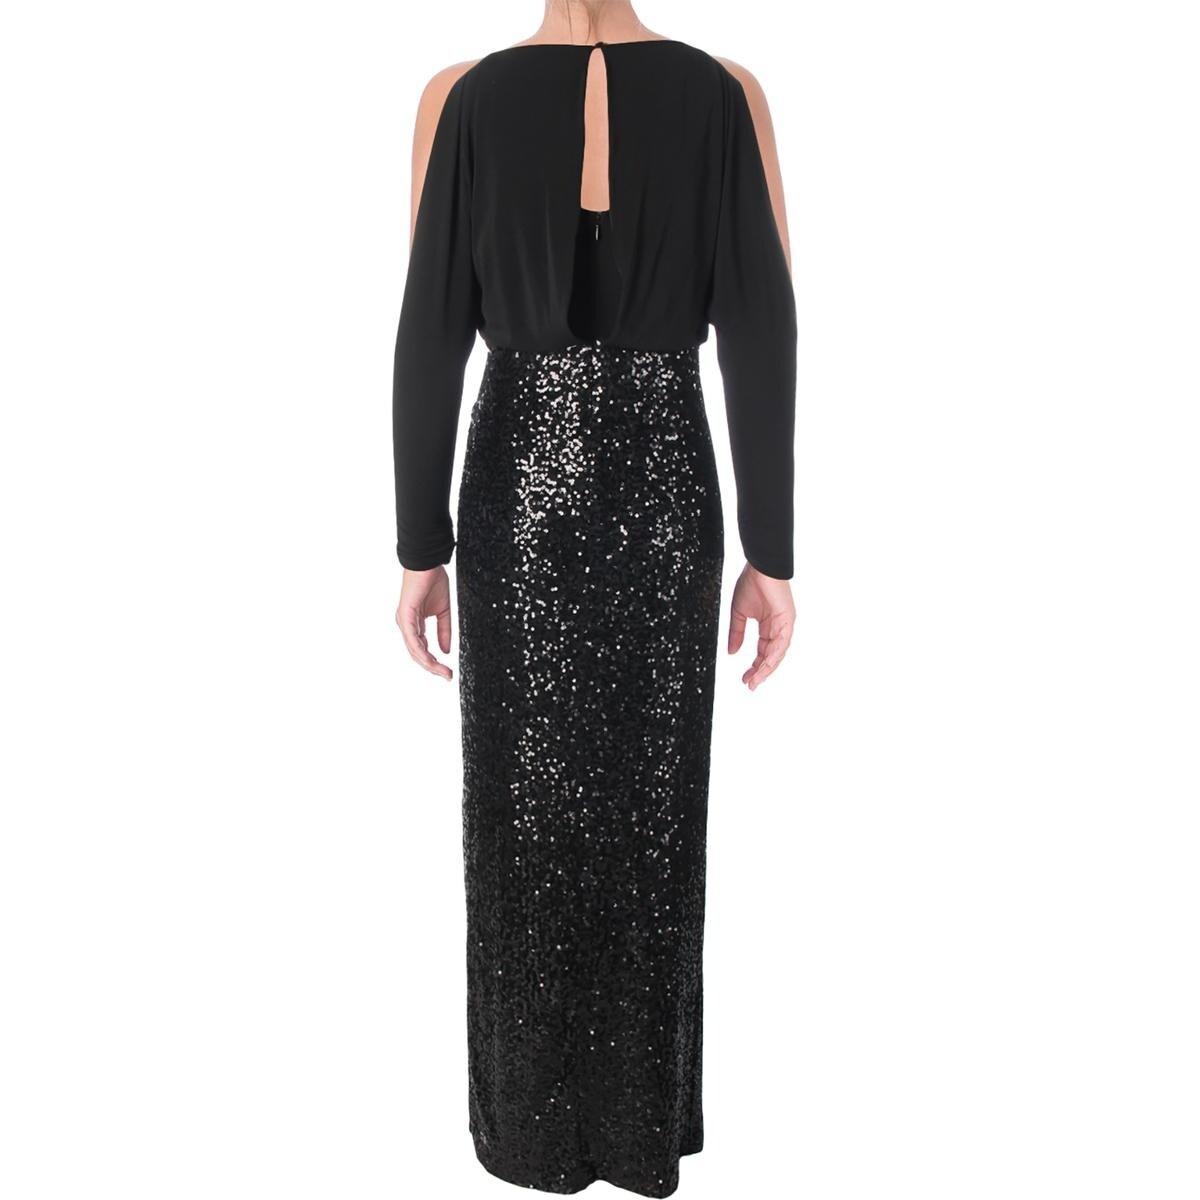 7ecbc114dc Shop Lauren Ralph Lauren Womens Semi-Formal Dress Evening Sequin - Free  Shipping Today - Overstock.com - 23141167